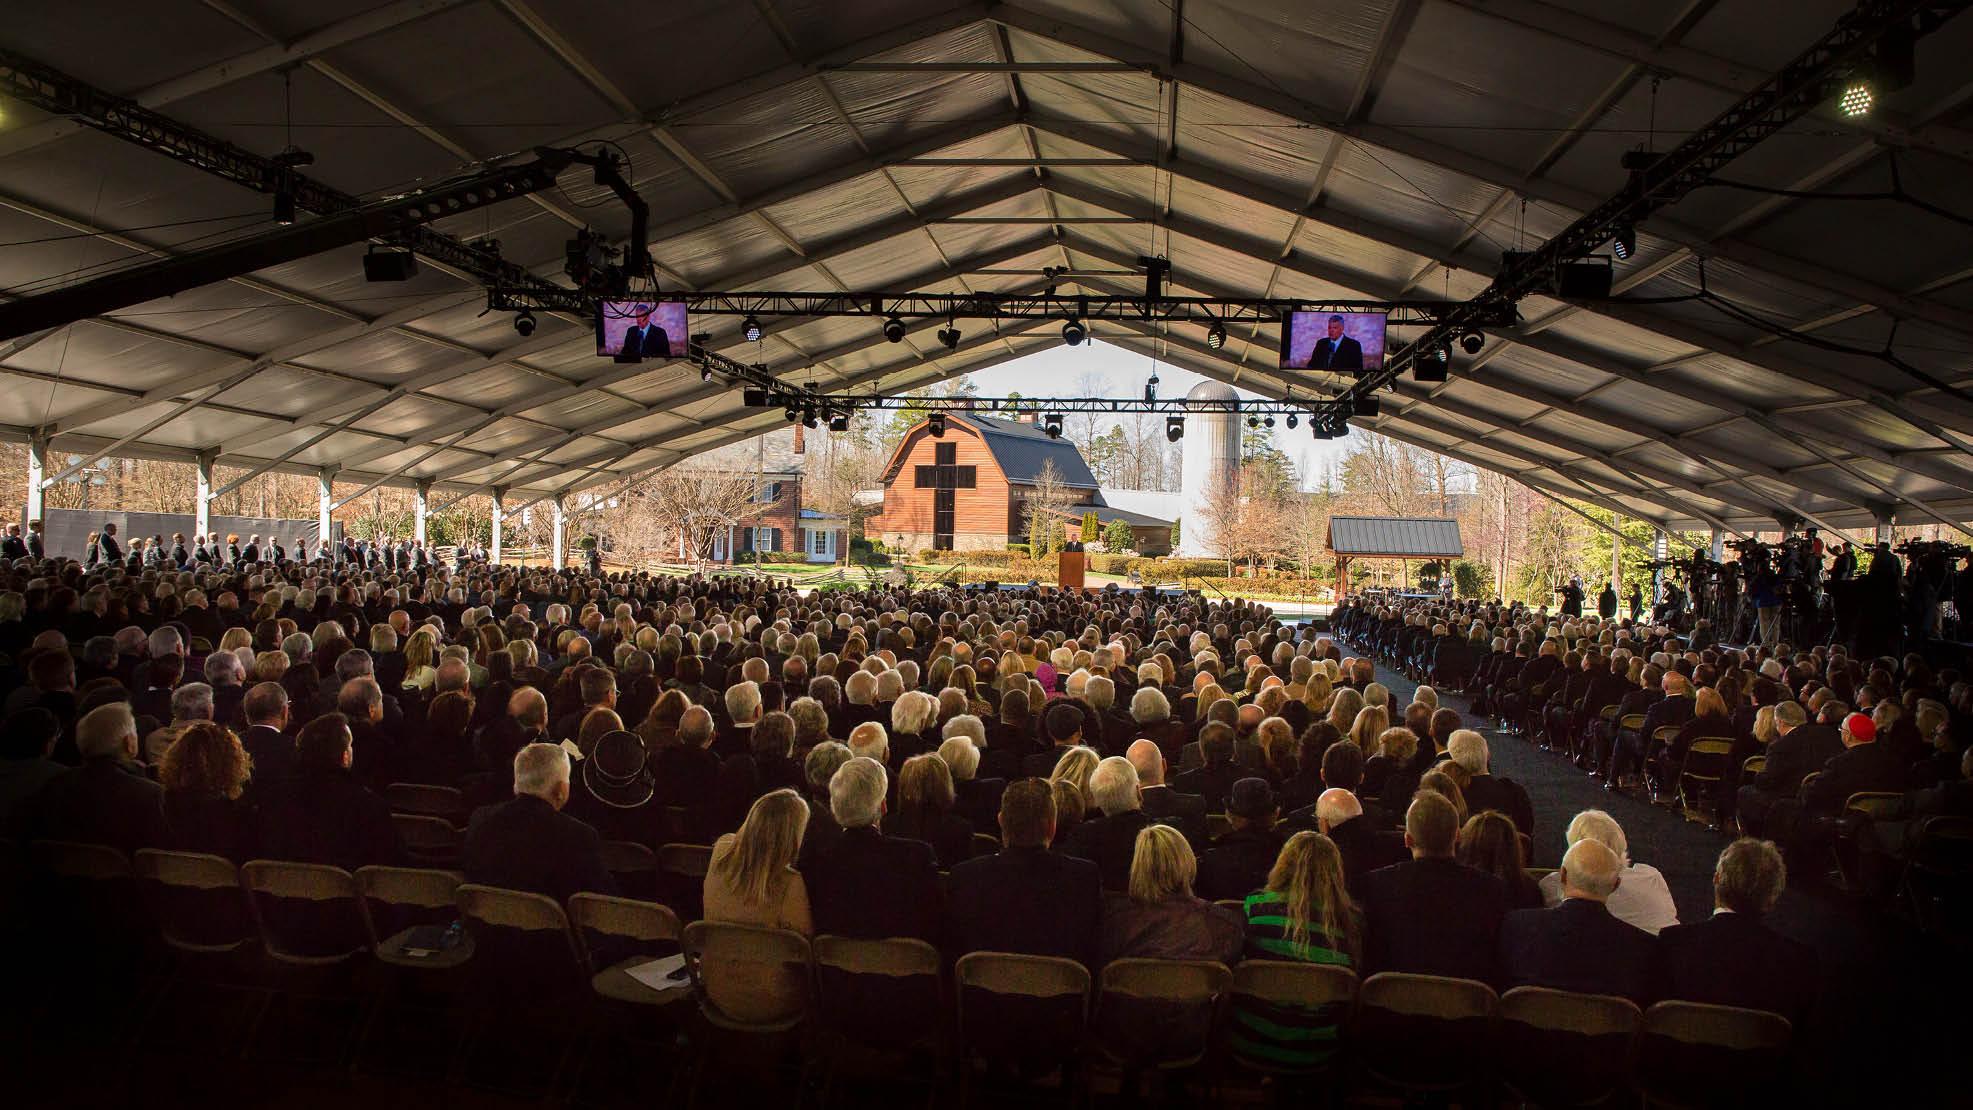 Billy Graham Memorial Exhibit Funeral.jpg